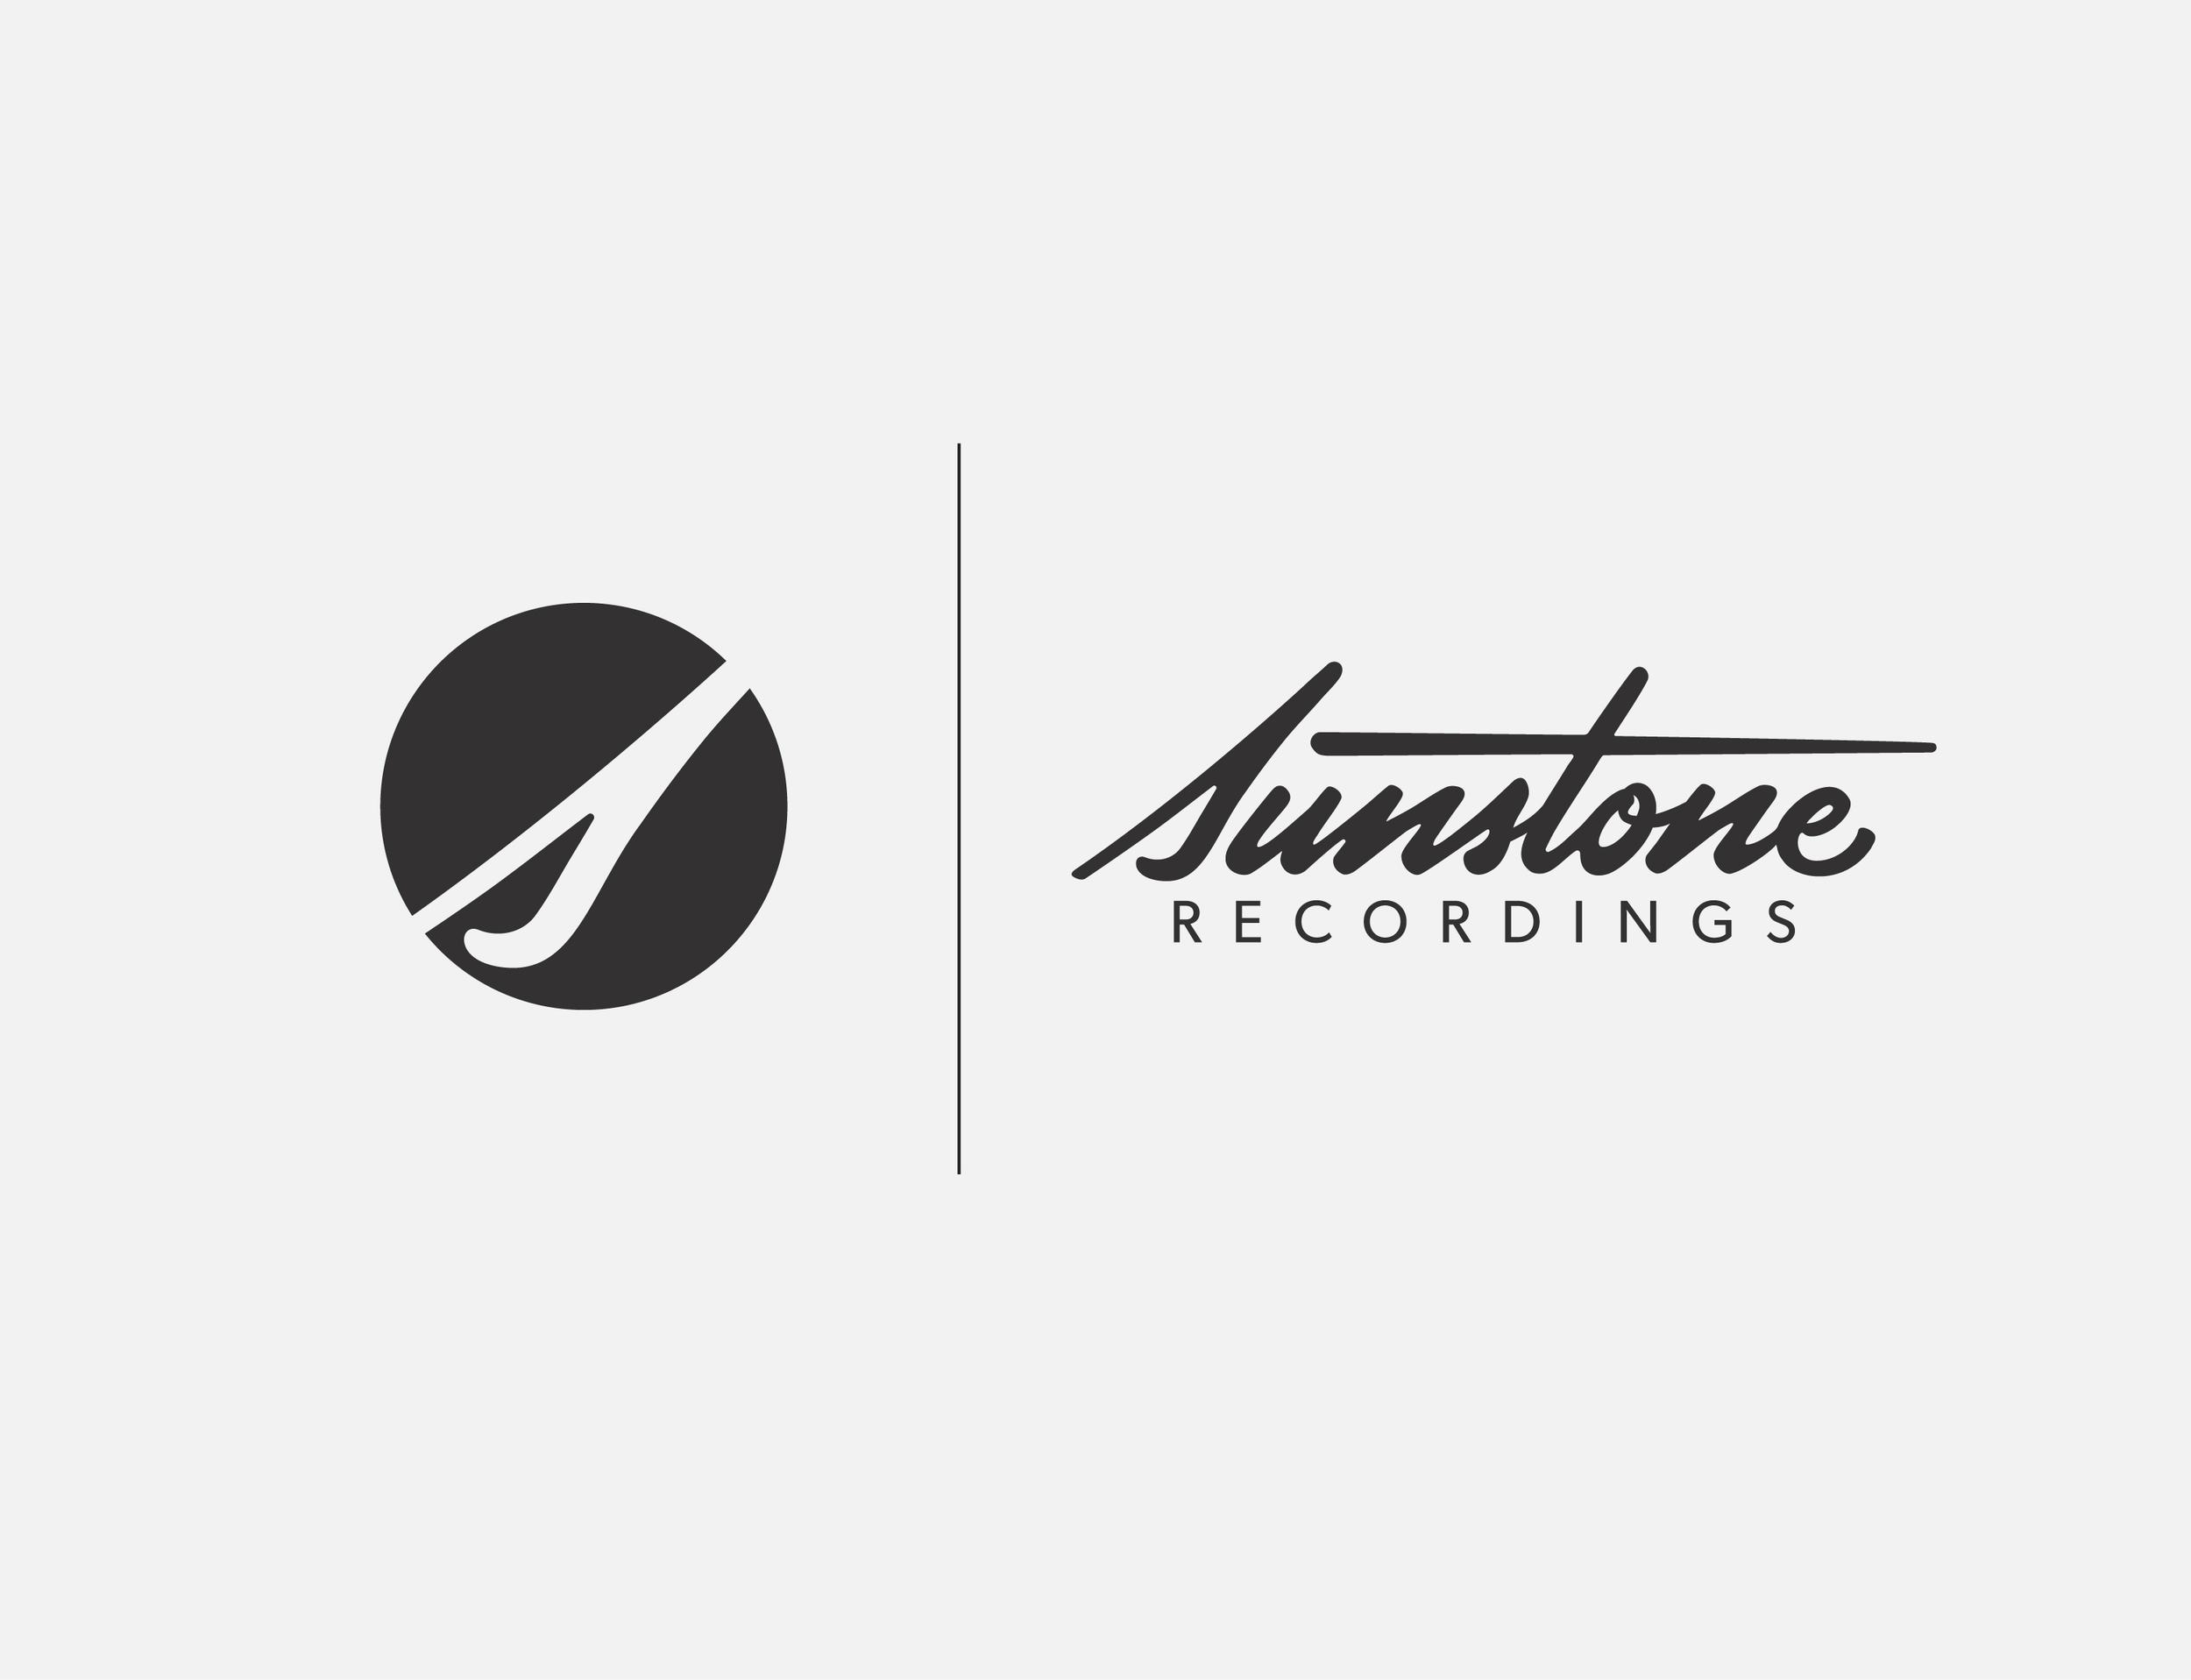 Sunstone Recordings Combined 1